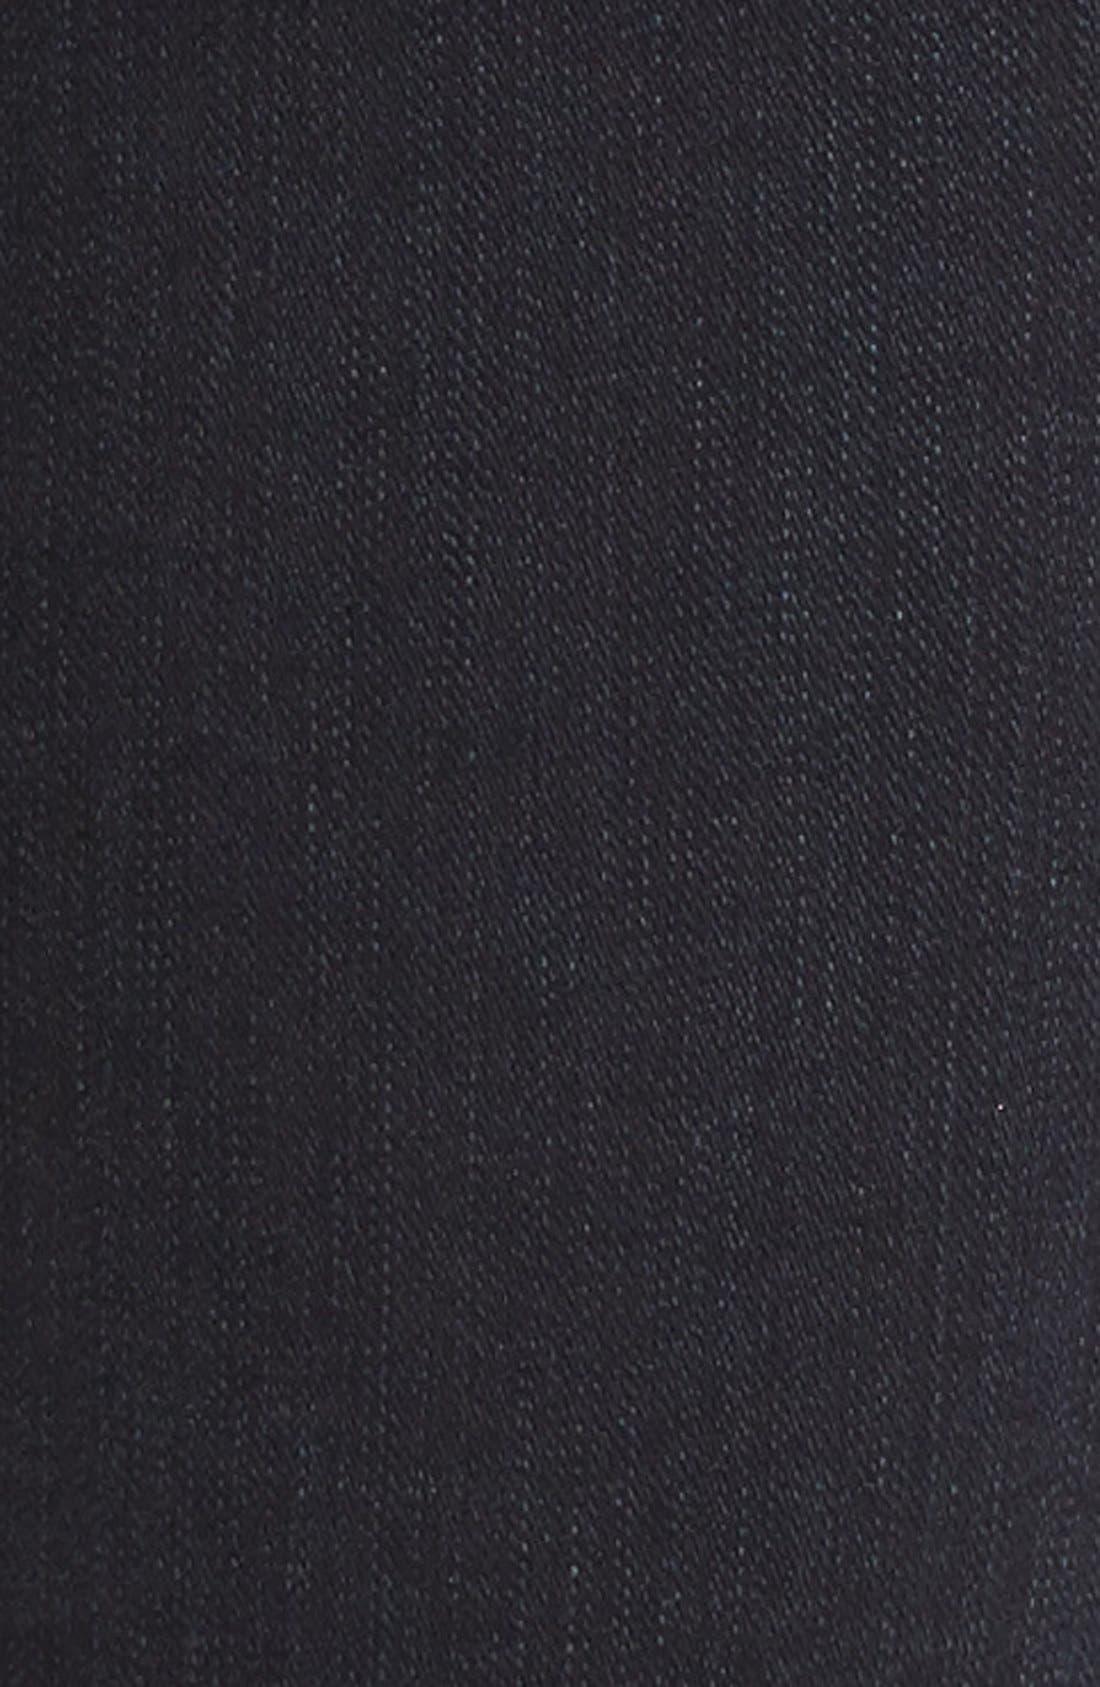 'Peri' Straight Leg Pull-On Jeans,                             Alternate thumbnail 2, color,                             001